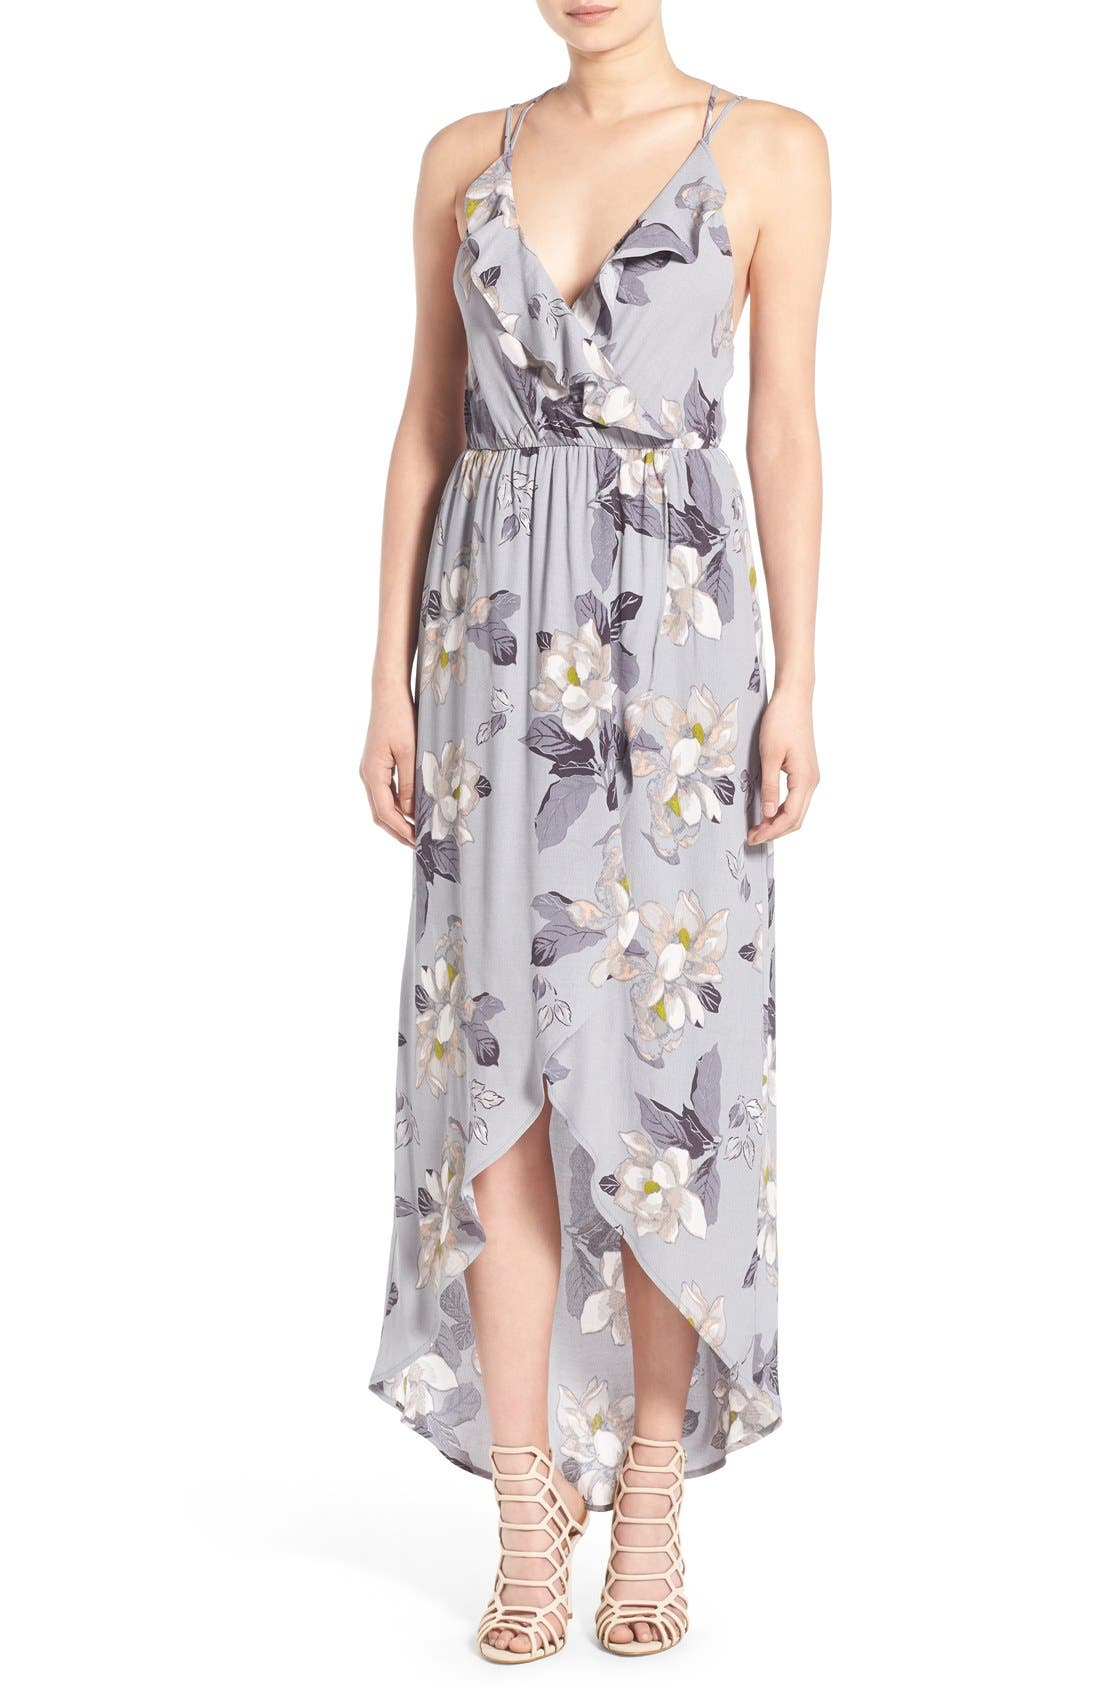 ASTR Ruffle Surplice High/Low Maxi Dress,                             Main thumbnail 1, color,                             Grey Multi Floral